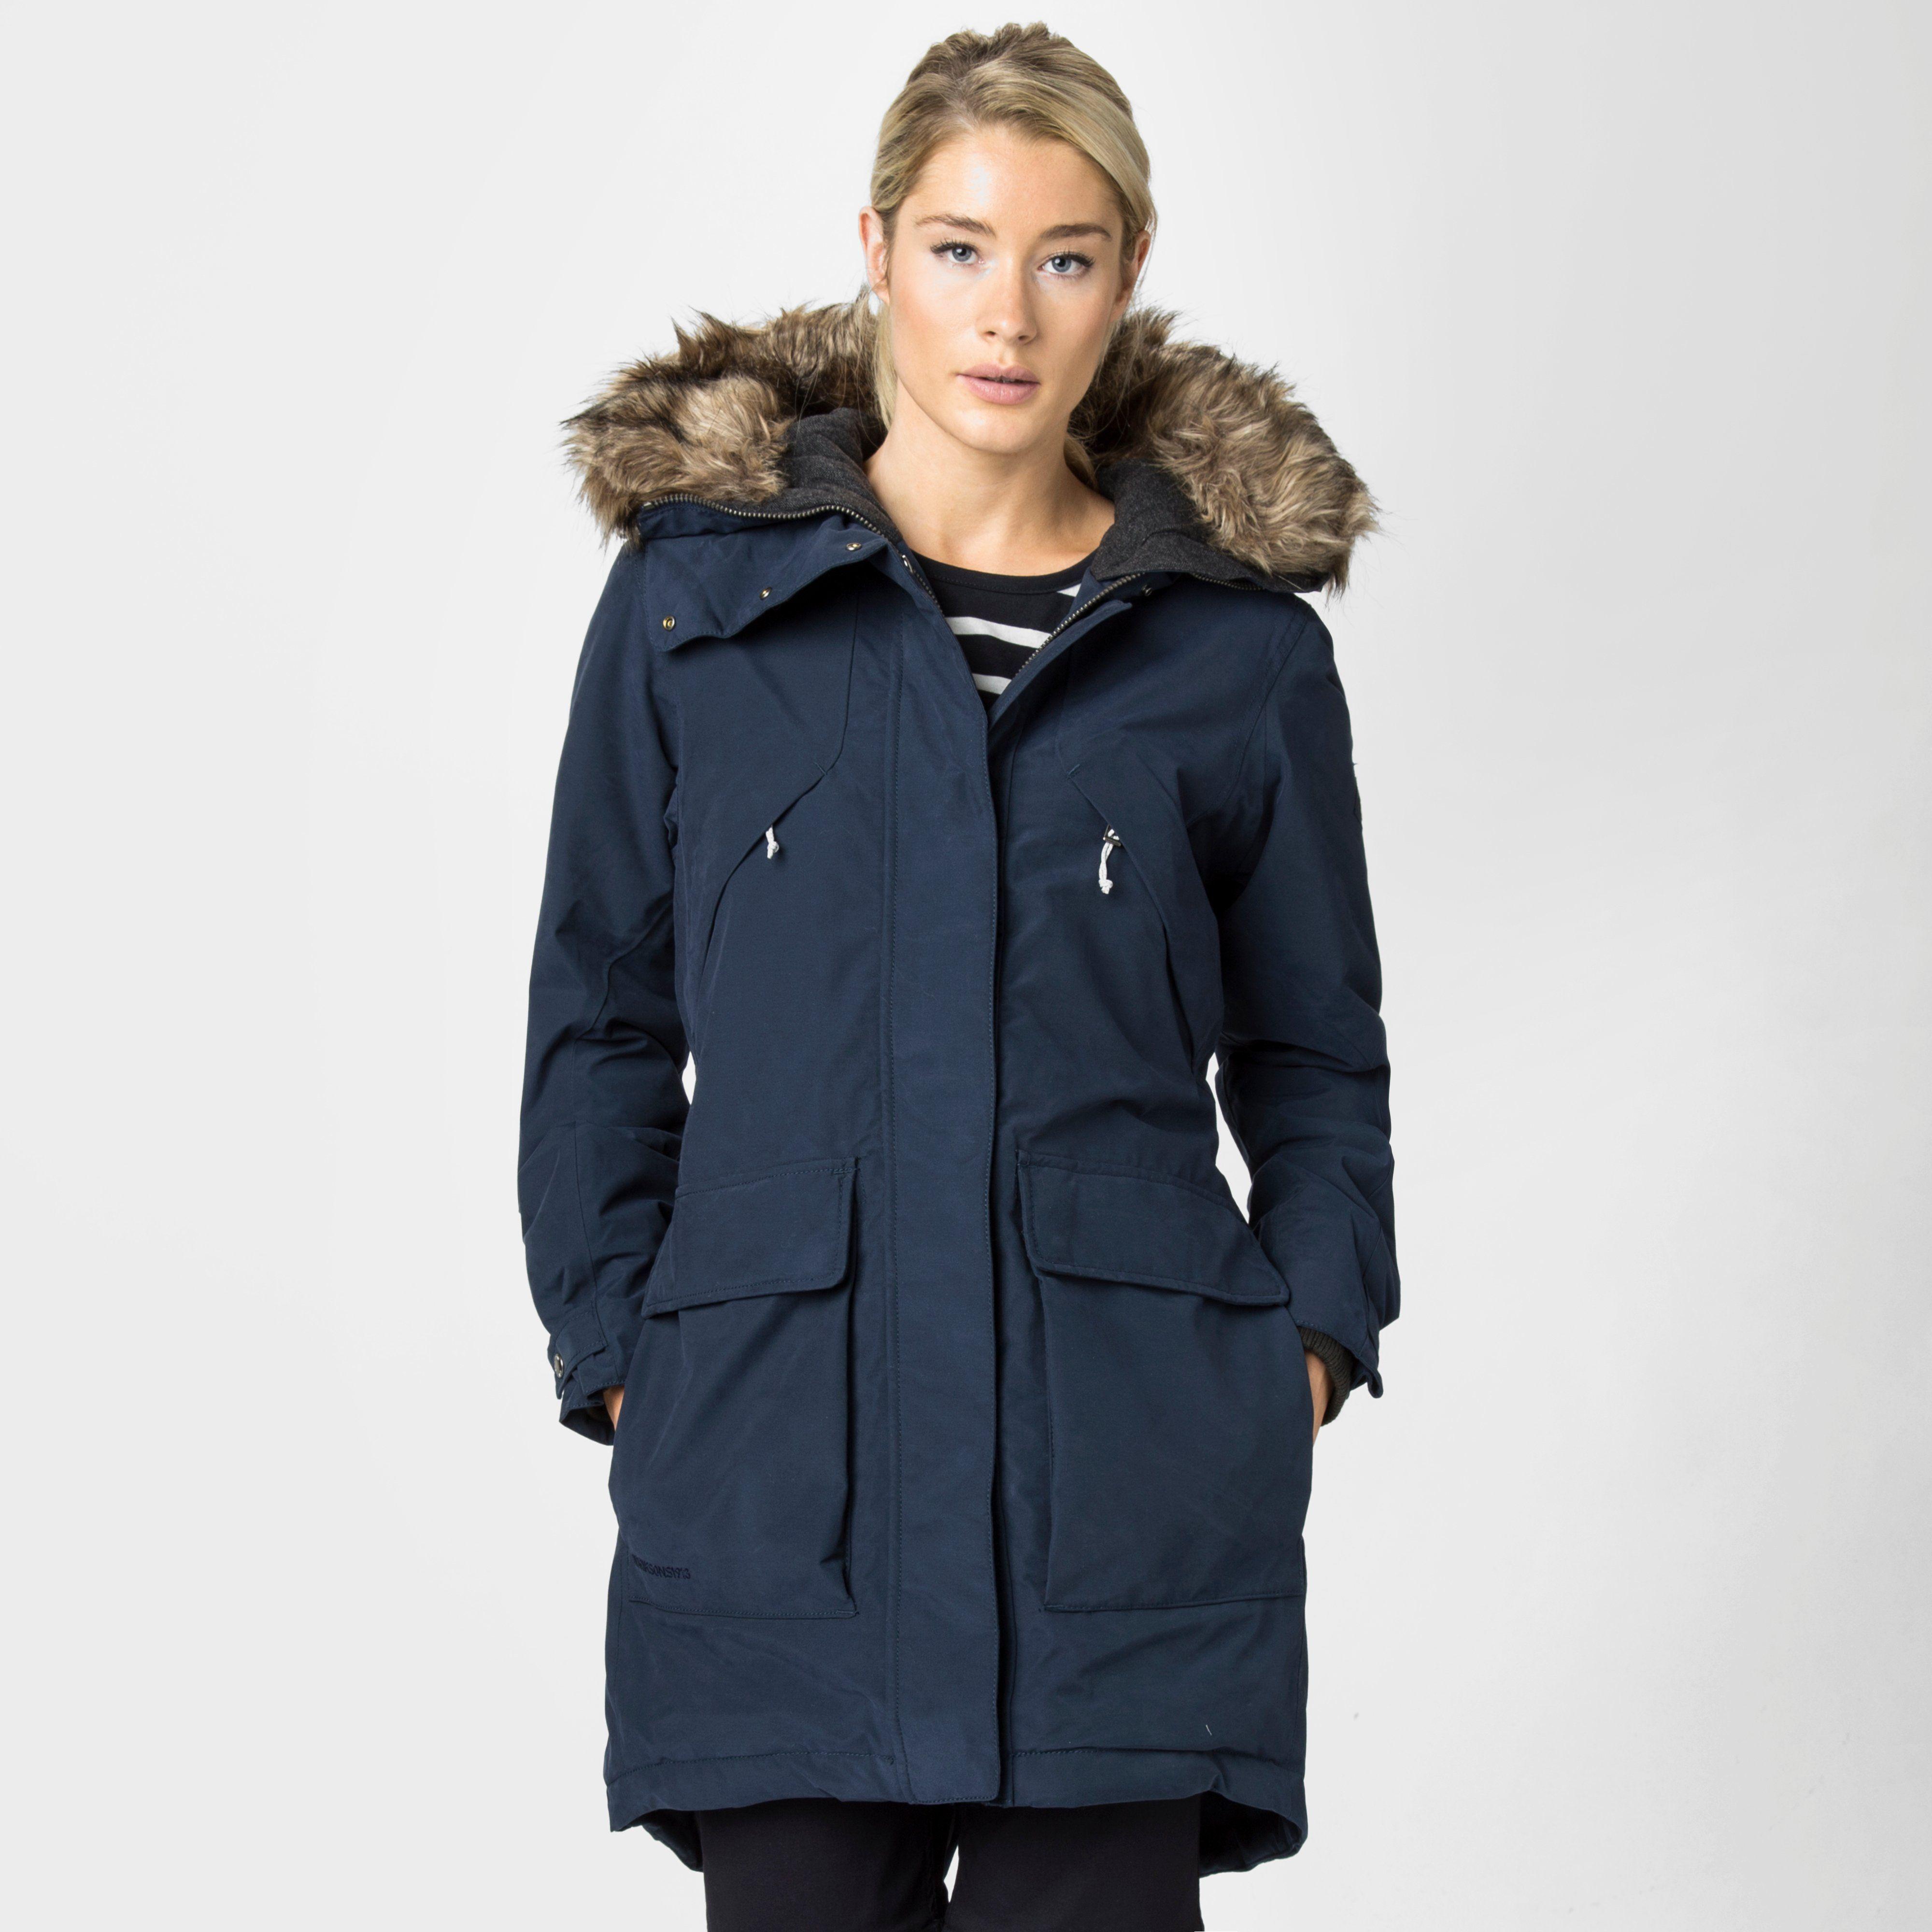 DIDRIKSONS Women's Lina Parka Jacket